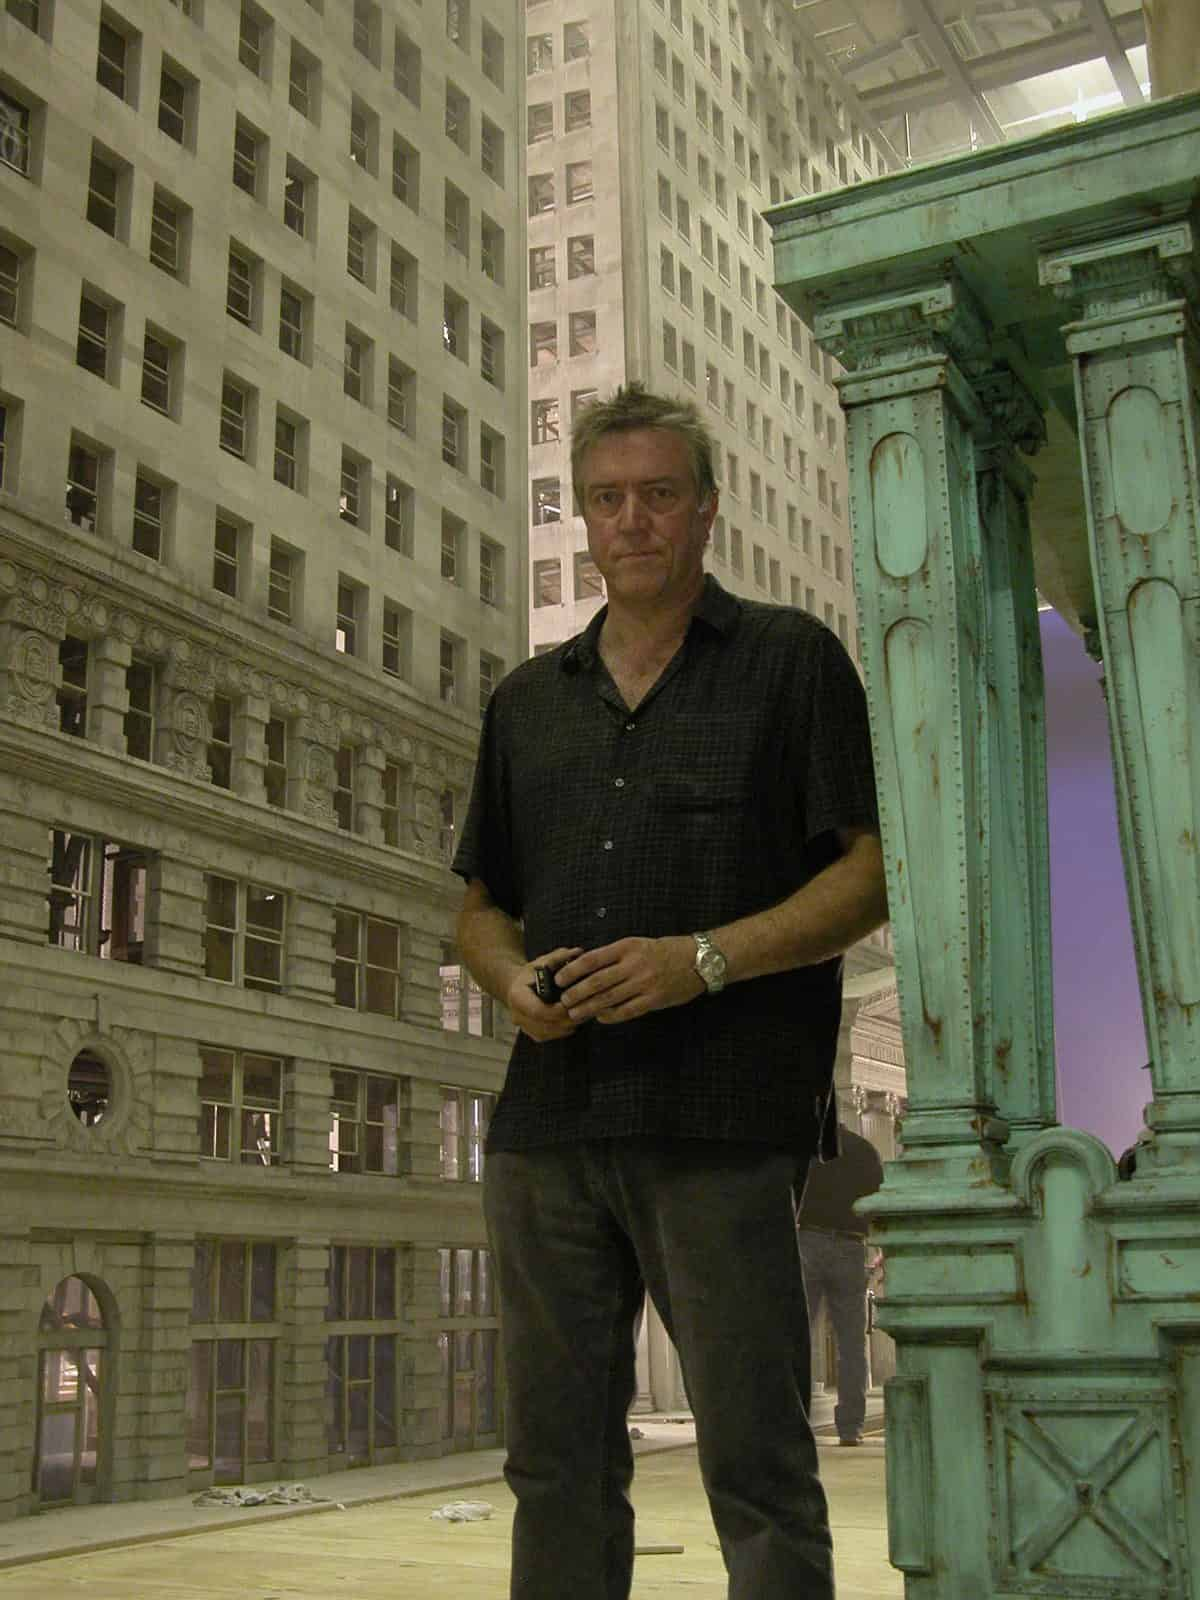 Steve takes a stroll through Gotham City